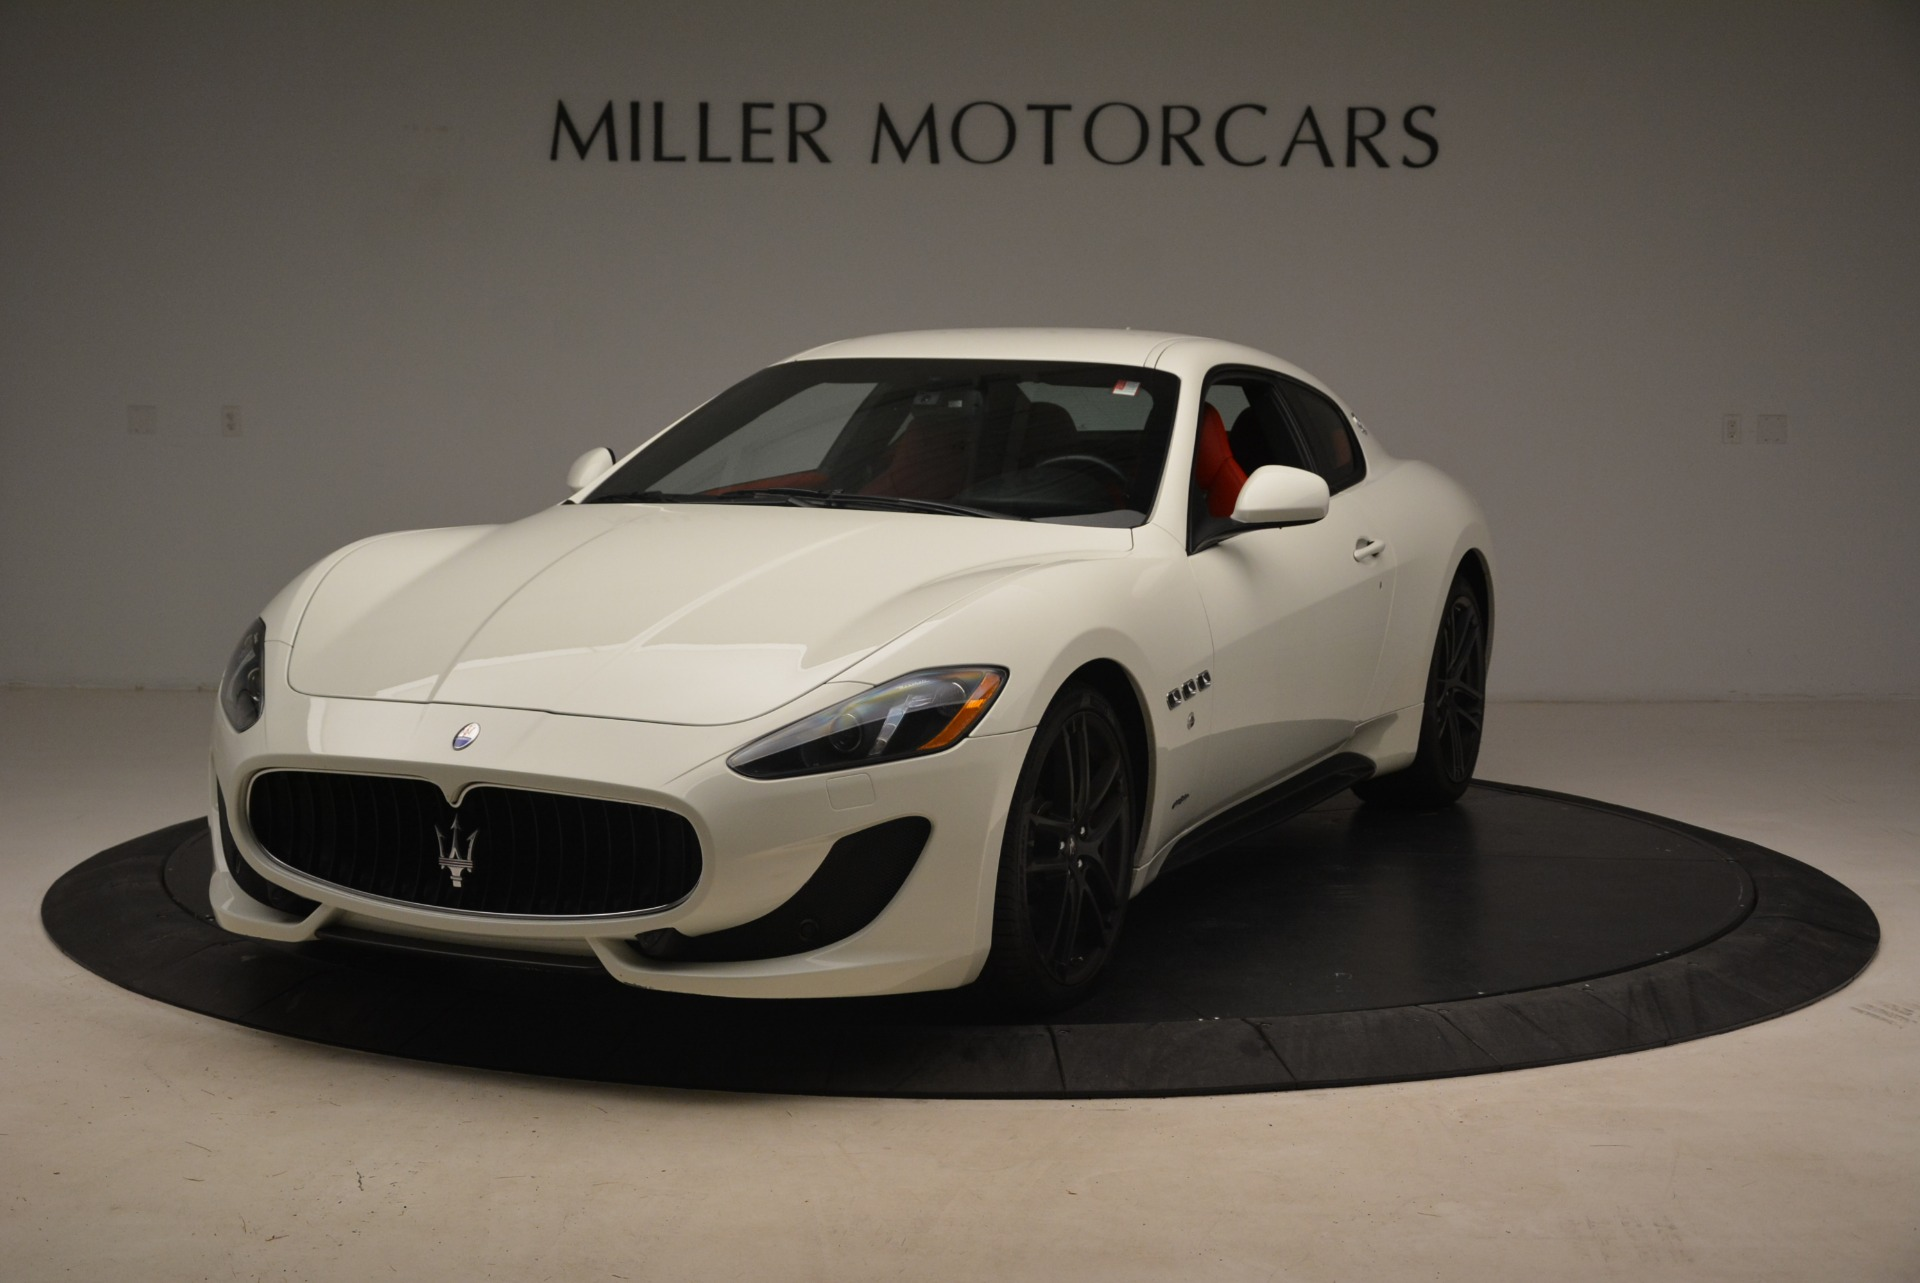 Used 2015 Maserati GranTurismo Sport for sale Sold at Pagani of Greenwich in Greenwich CT 06830 1